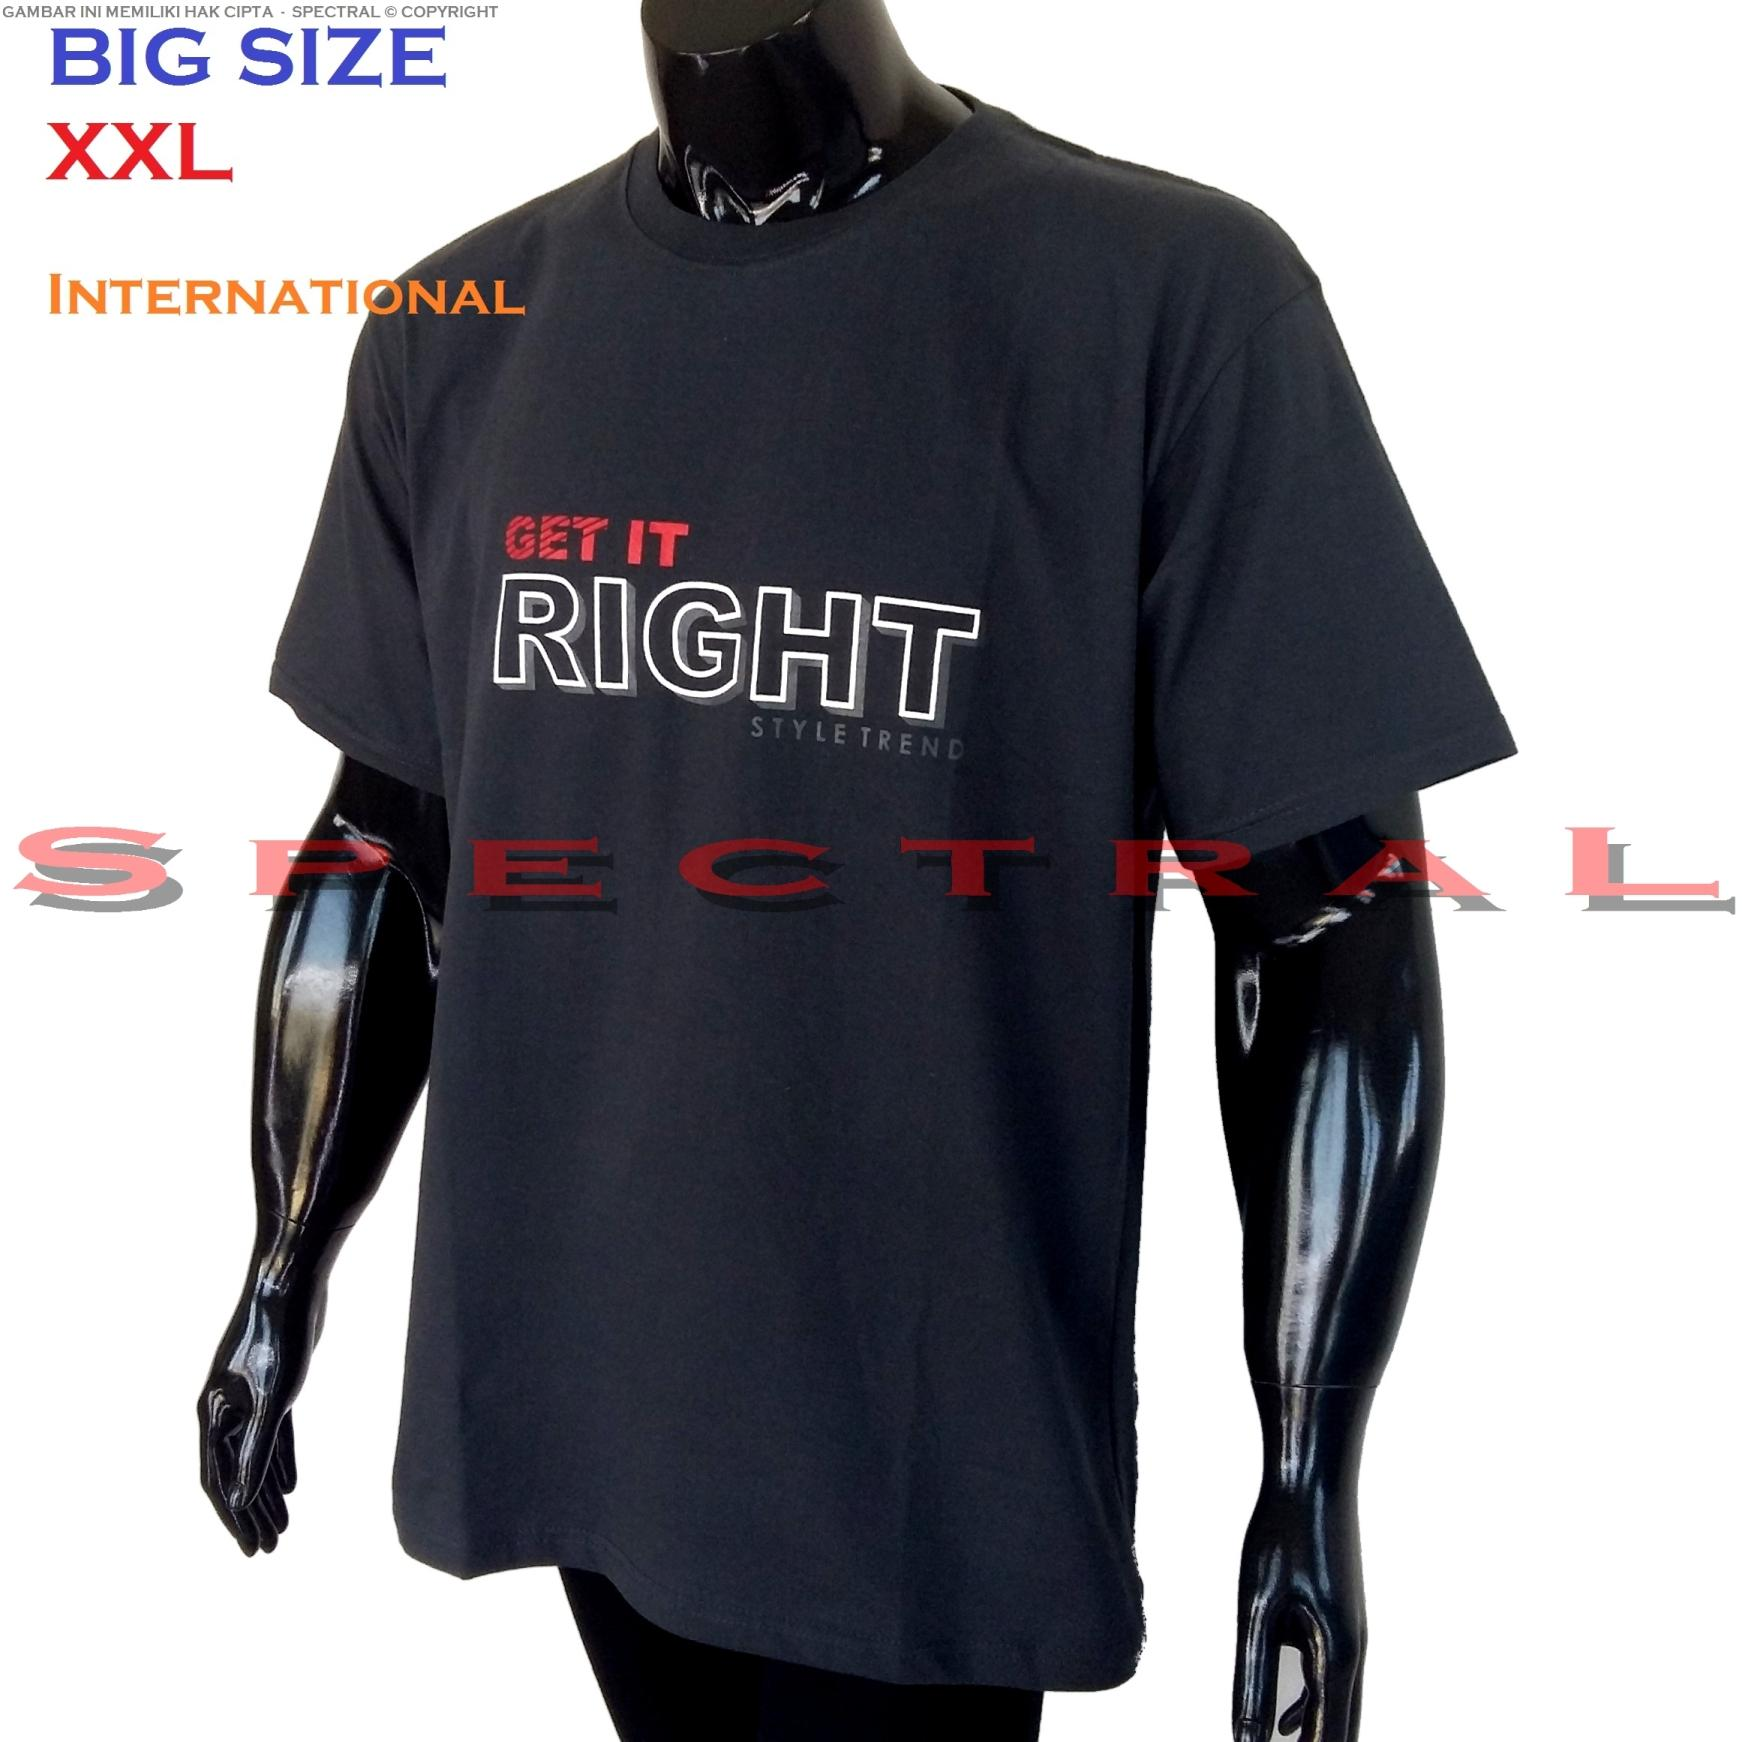 Spectral – BIG SIZE XXL INTERNATIONAL 100{55e037da9a70d2f692182bf73e9ad7c46940d20c7297ef2687c837f7bdb7b002} Soft Cotton Combed Kaos Distro Jumbo BIGSIZE T-Shirt Fashion Ukuran Besar Polos Celana Atasan Pria Wanita Katun Bapak Orang Tua Gemuk Gendut Lengan Simple Sport Casual 2L 2XL Baju Cowo Cewe Pakaian Terbaru